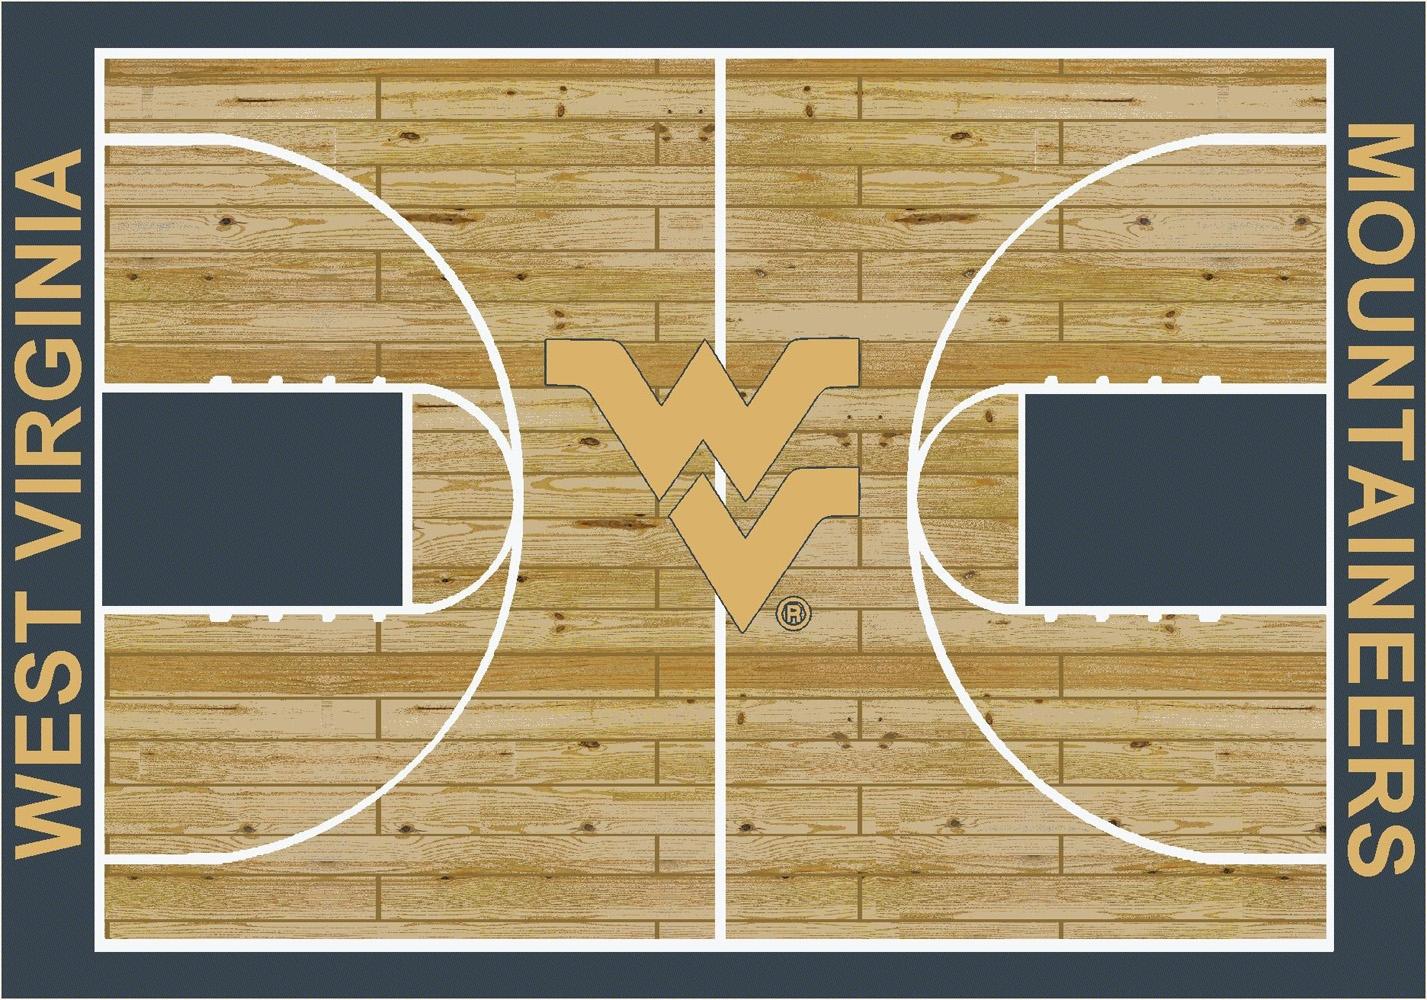 College Basketball Court University Of West Virginia 100